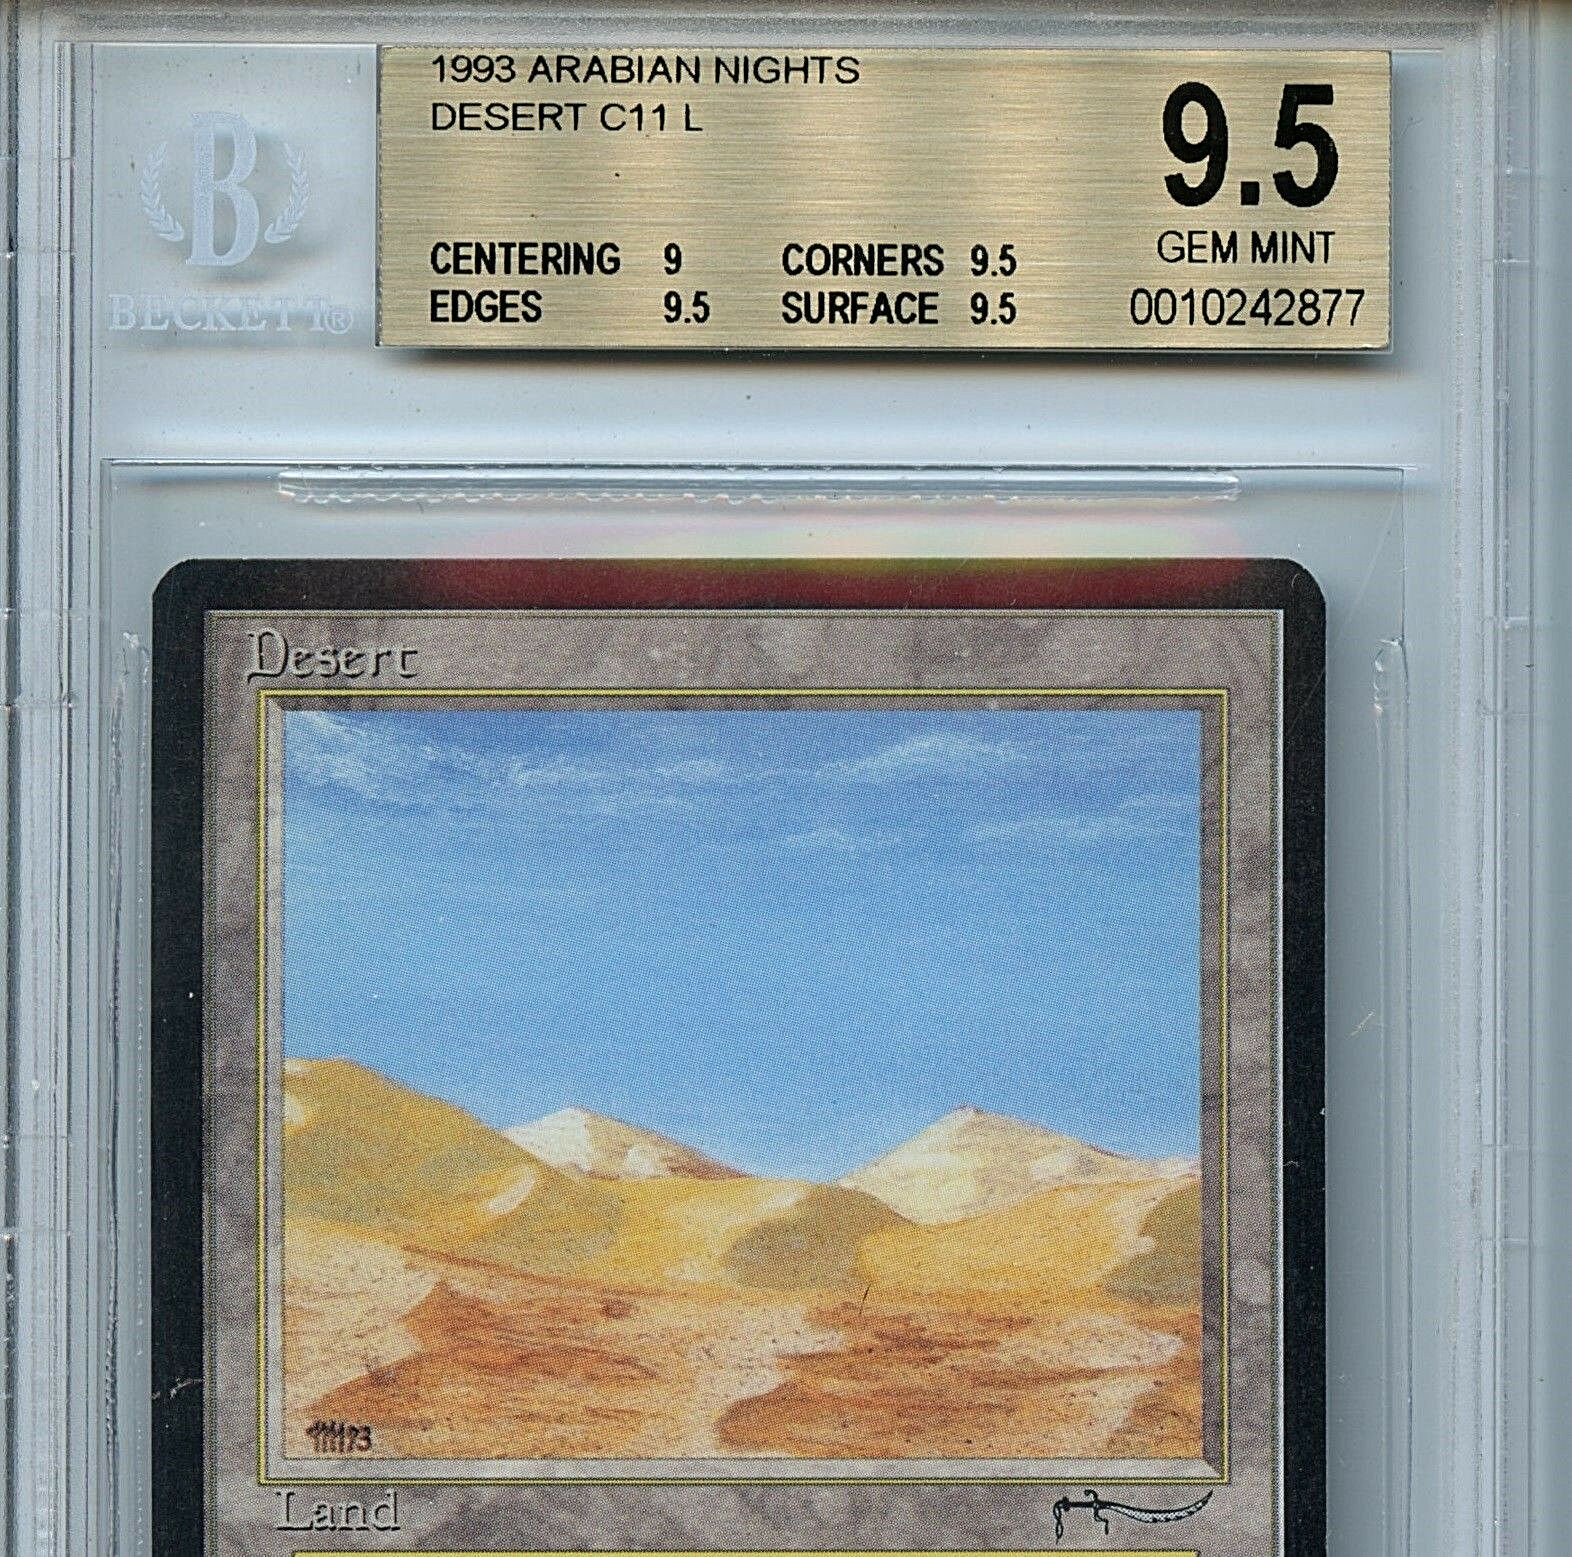 MTG Arabian Nights Desert BGS 9.5 Gem MINT Card Card Card Magic the Gathering WOTC 2877 30ce43